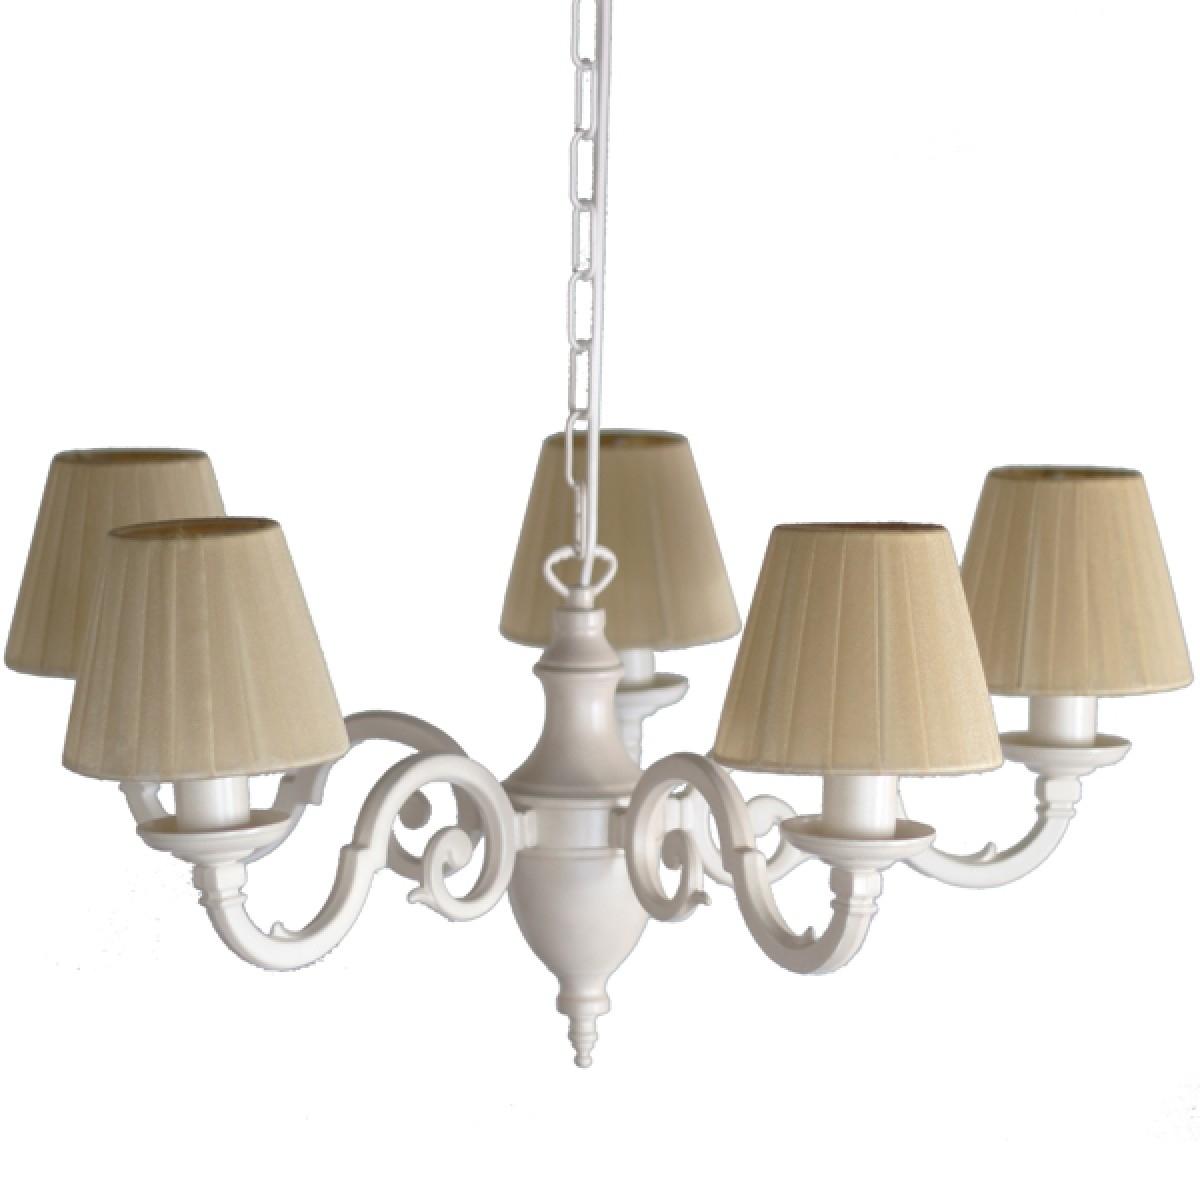 Favorite Bedroom Light Fitting Chandelier Inside Cream Chandelier (View 17 of 20)